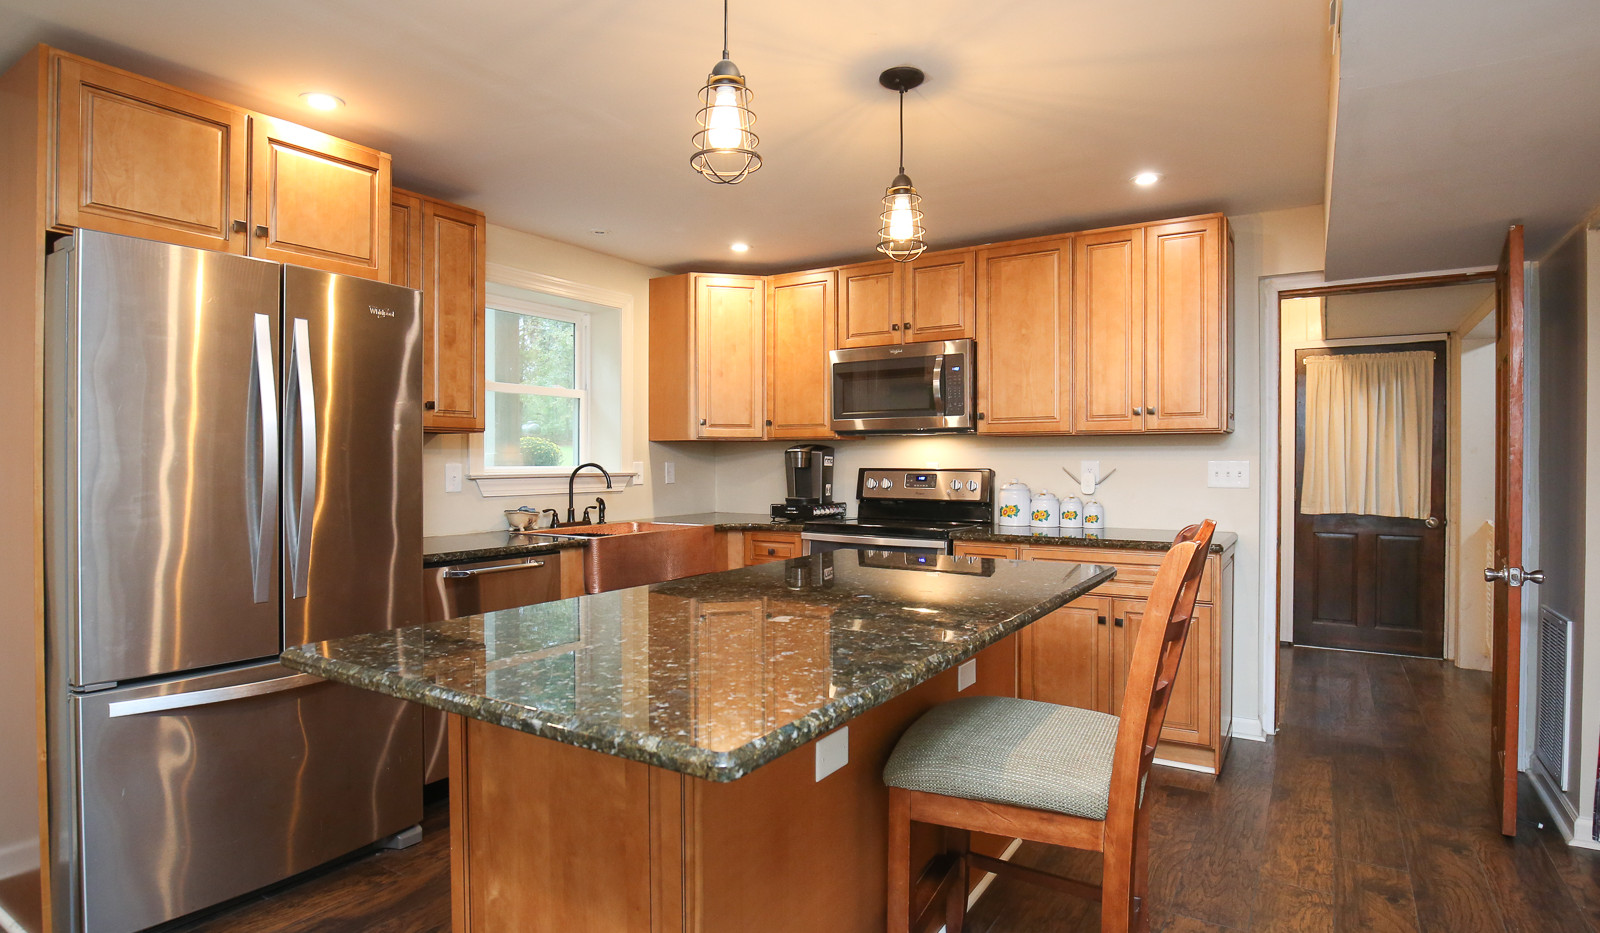 040_294_barnes_ave_kitchen.jpg